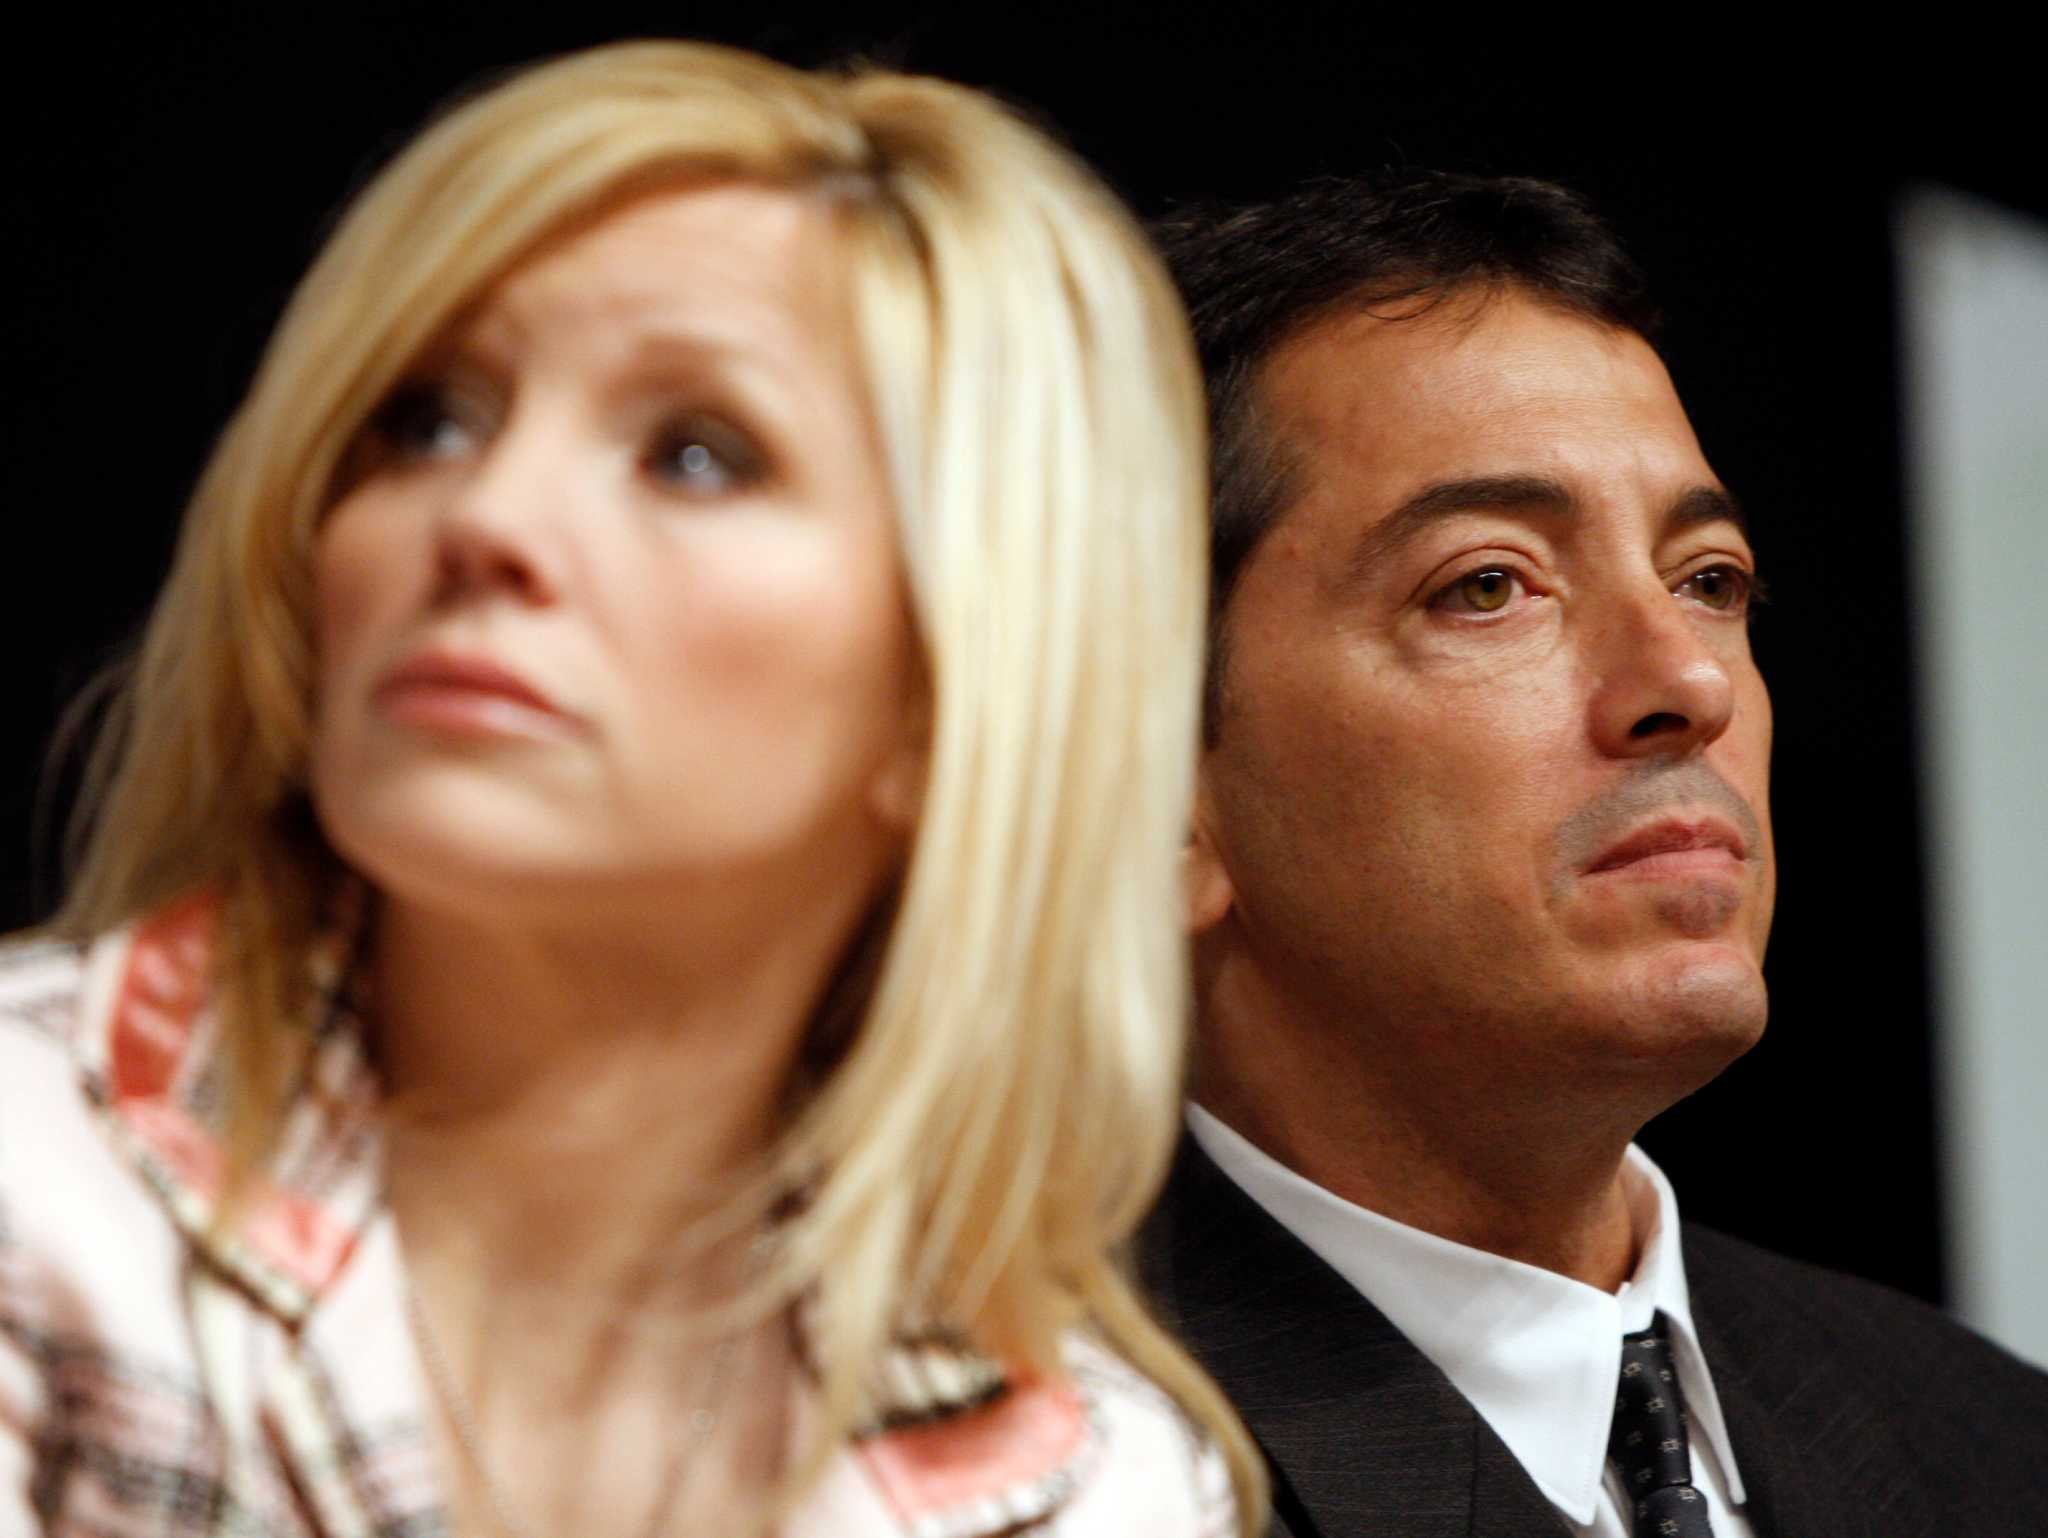 Scott Baios wife tells Sandy Hook mom: Maybe your